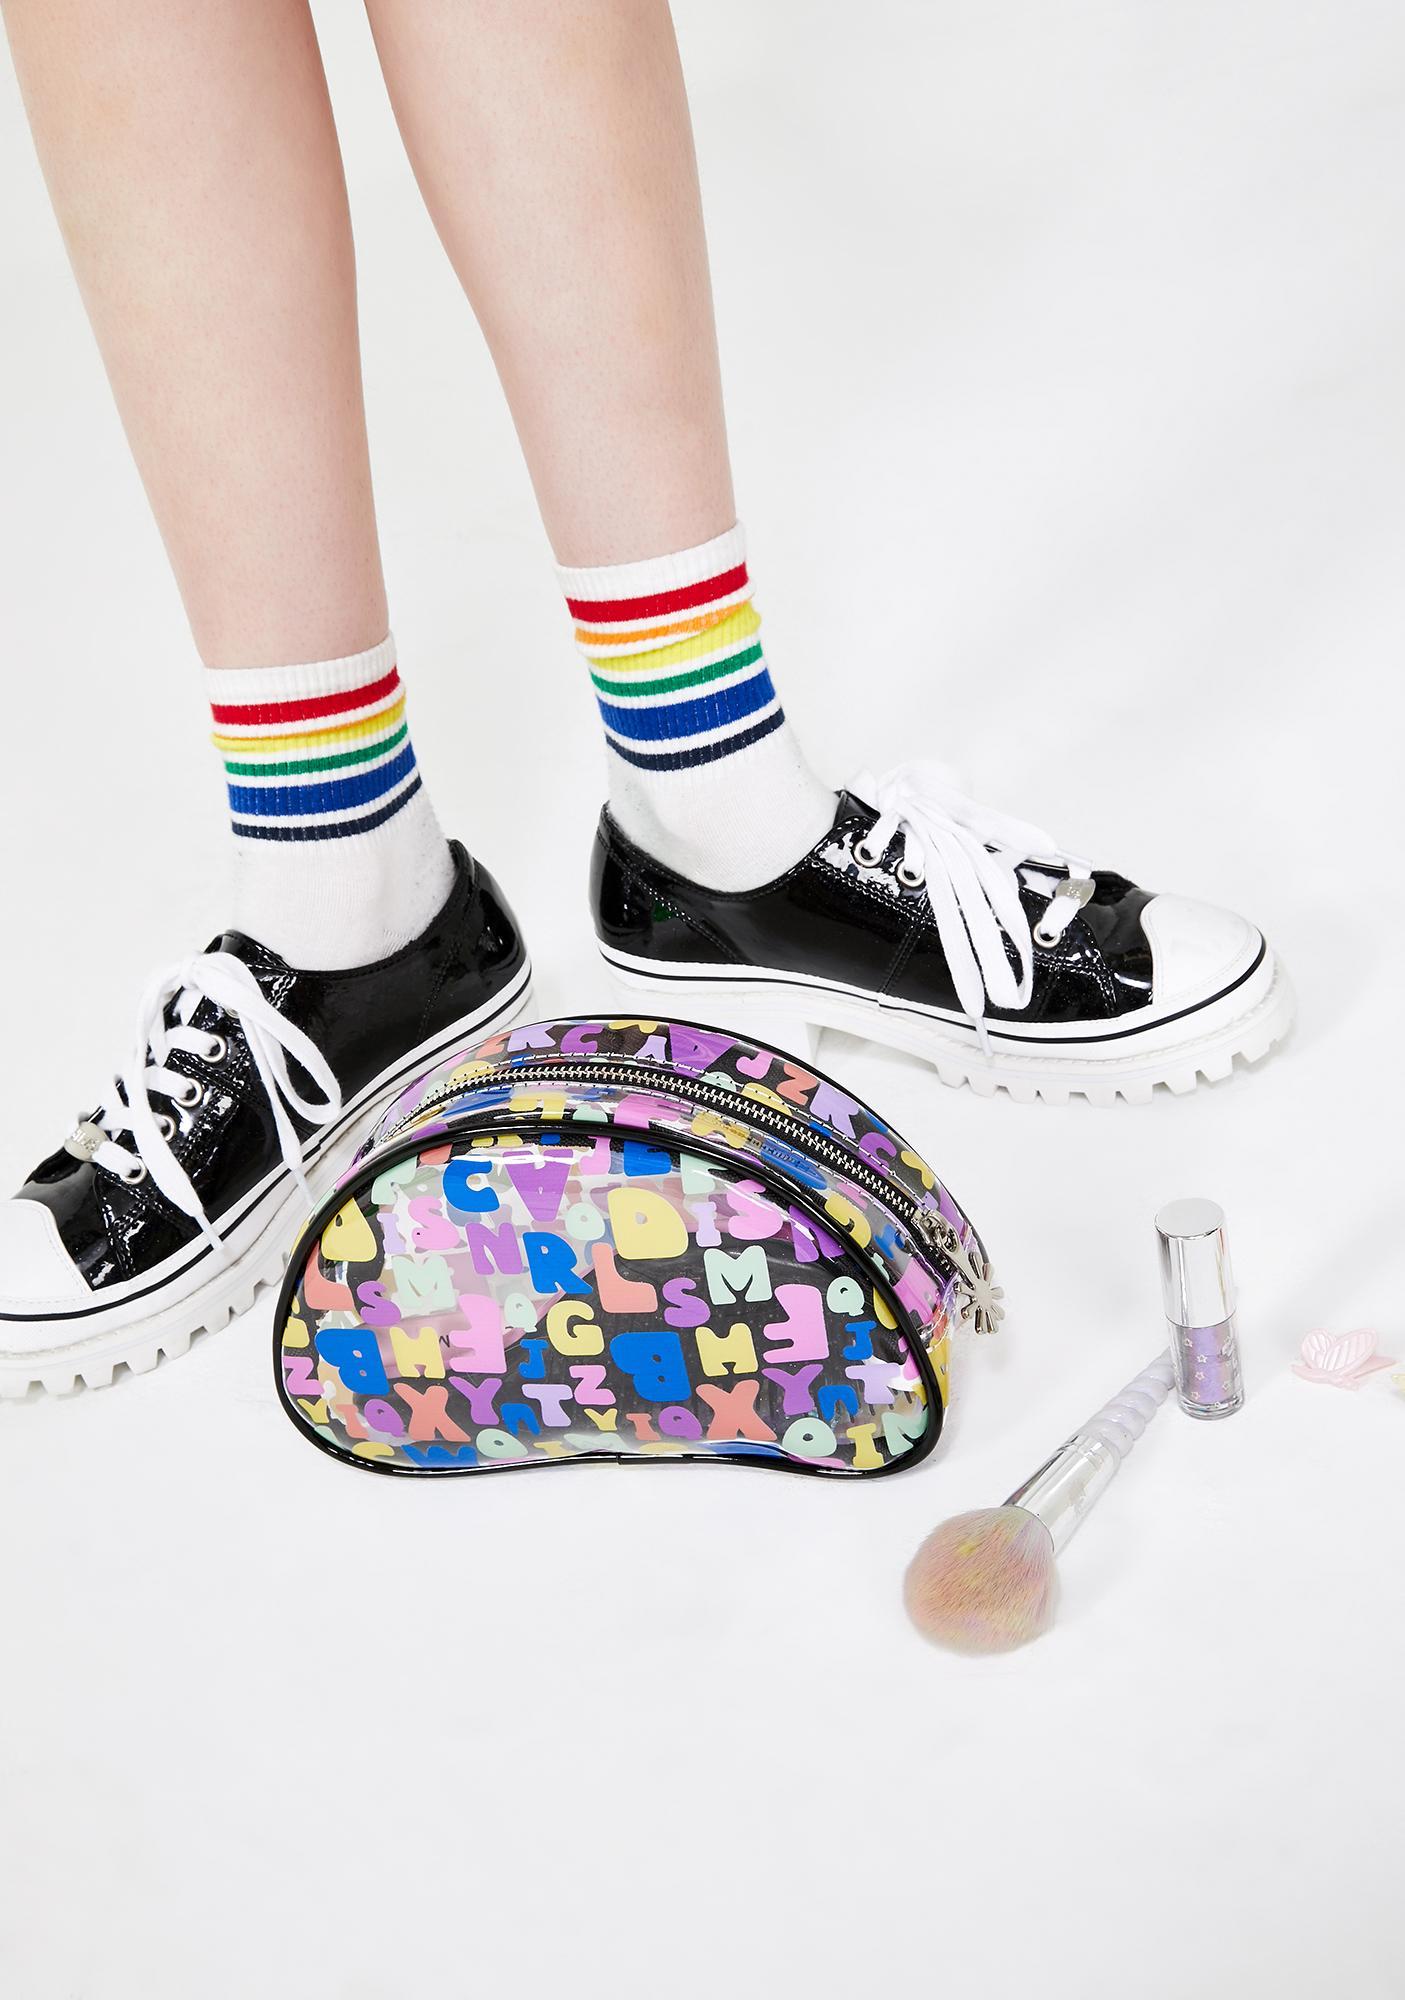 dELiA*s by Dolls Kill Hooked On U Makeup Bag